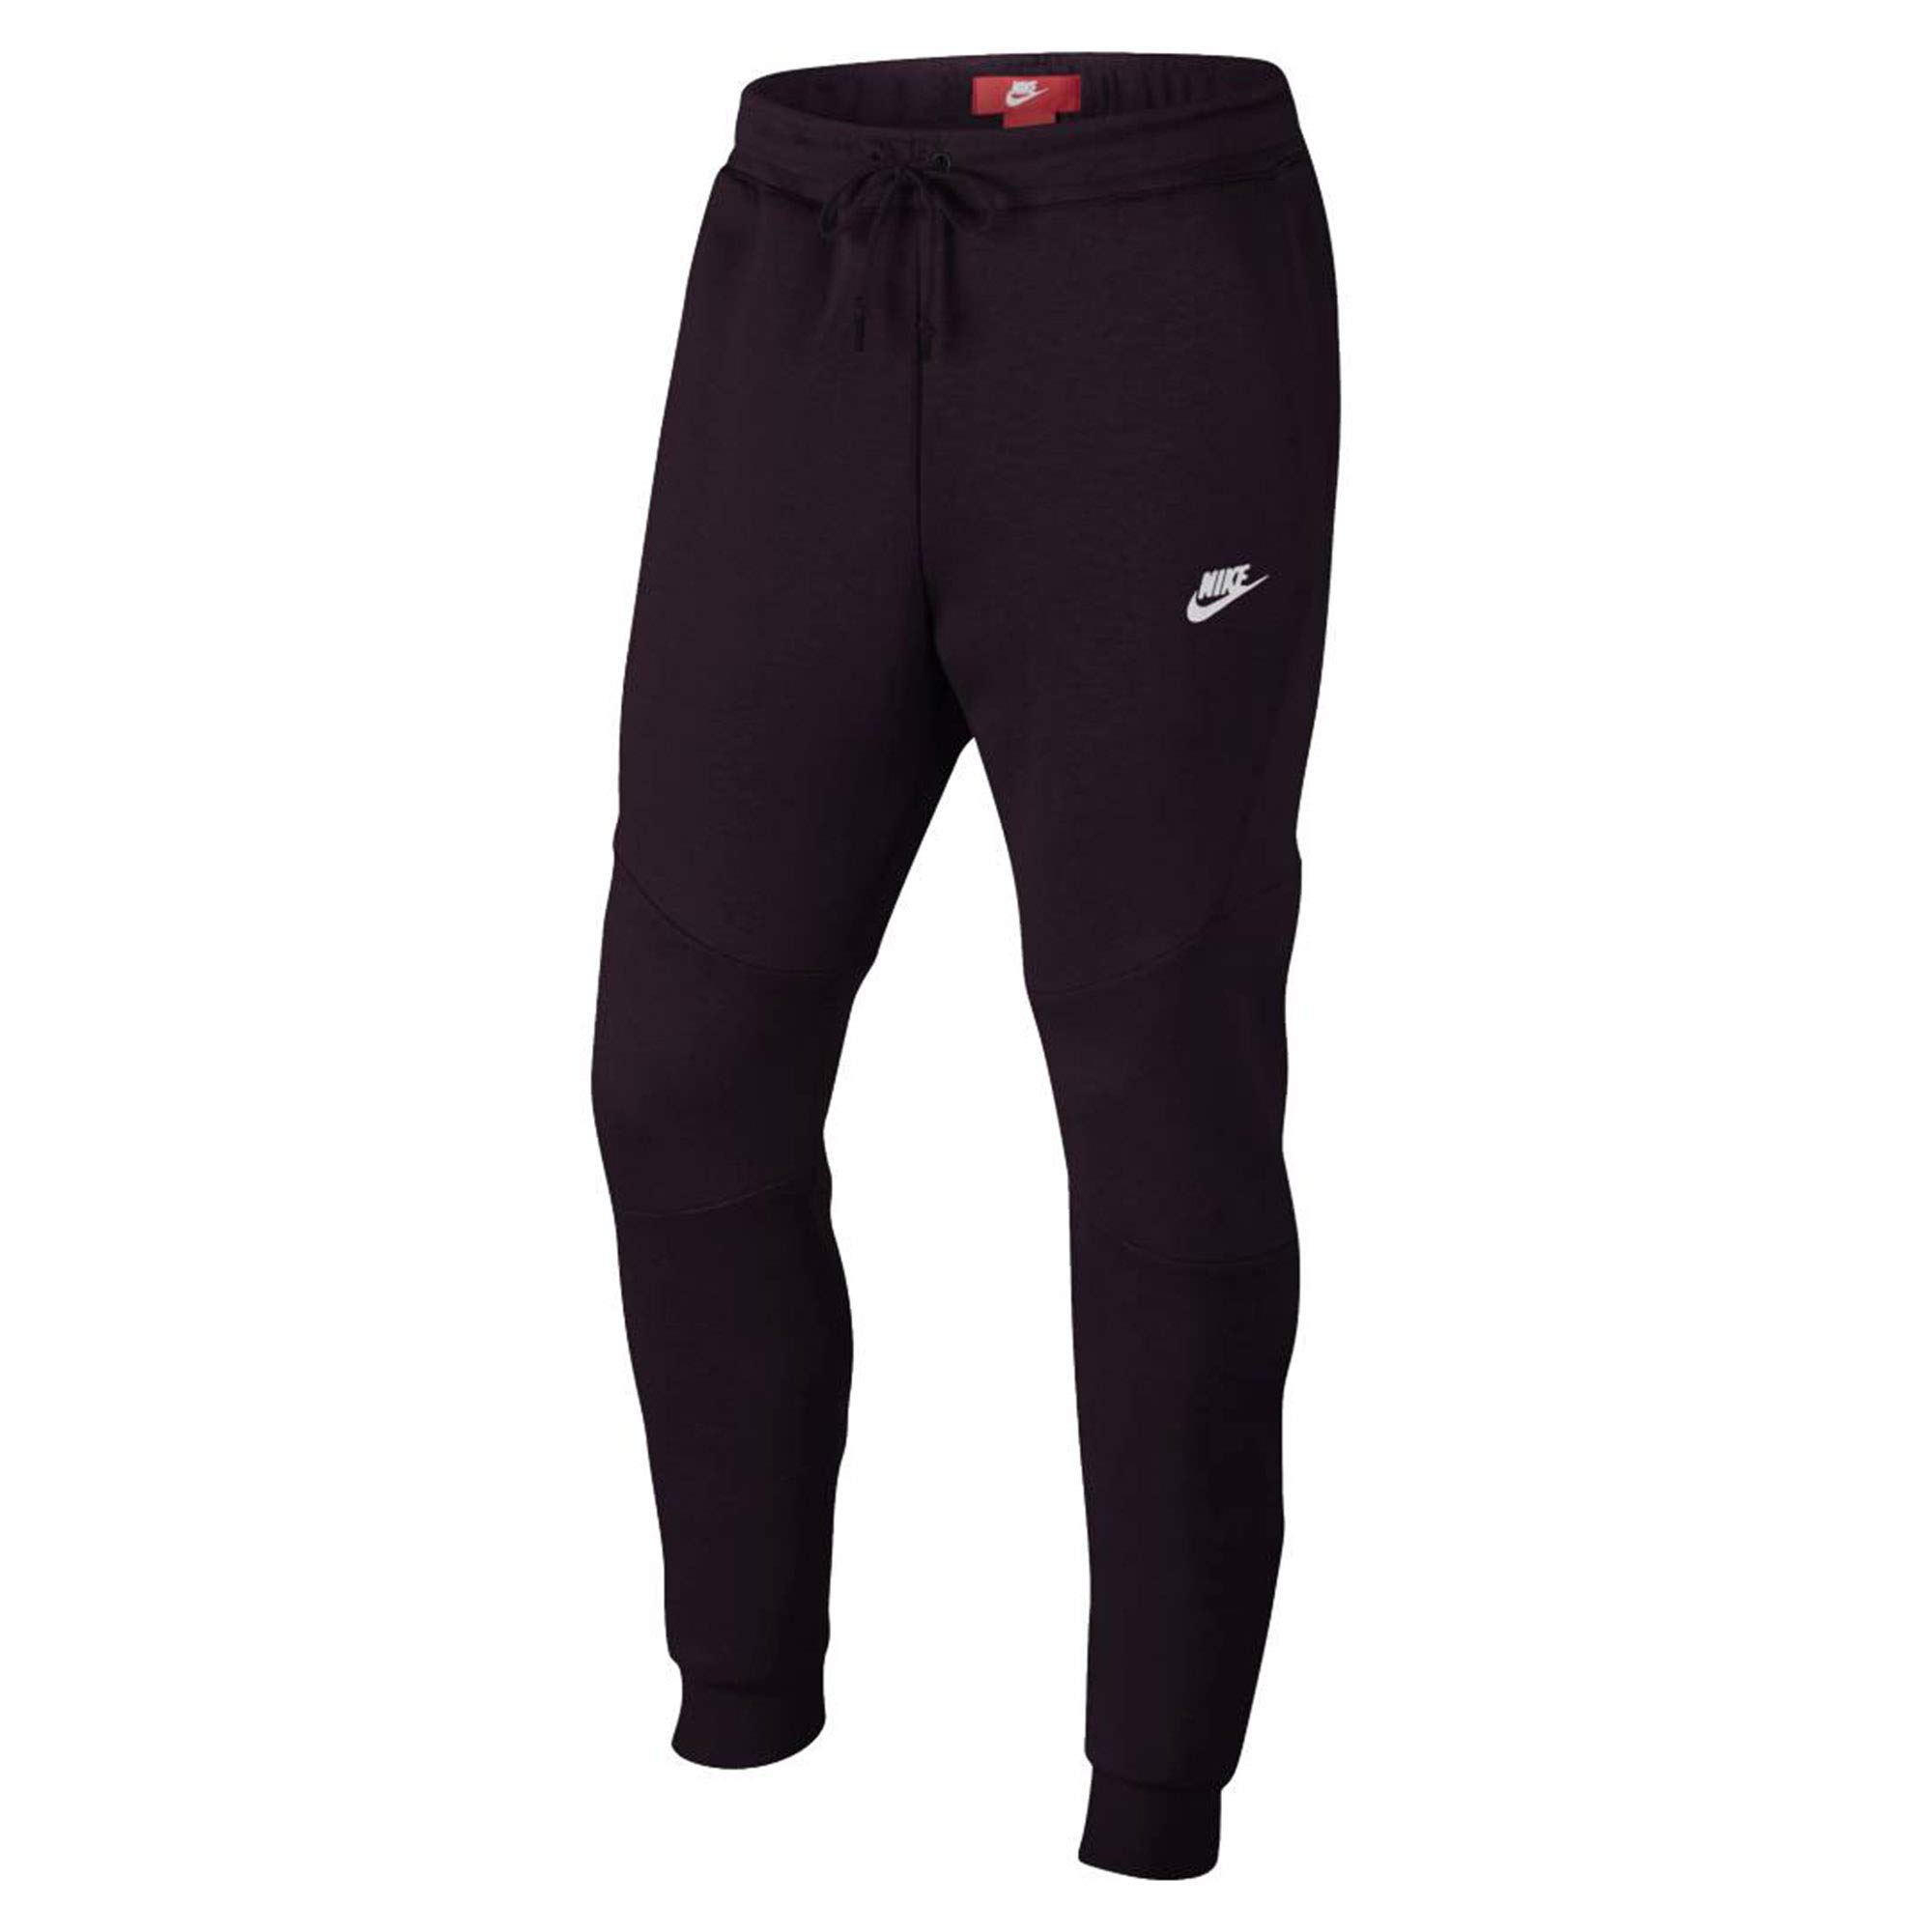 Nike Sportswear Tech Fleece Jogger Pant Mens Style: 805162-659 Size: 3XL